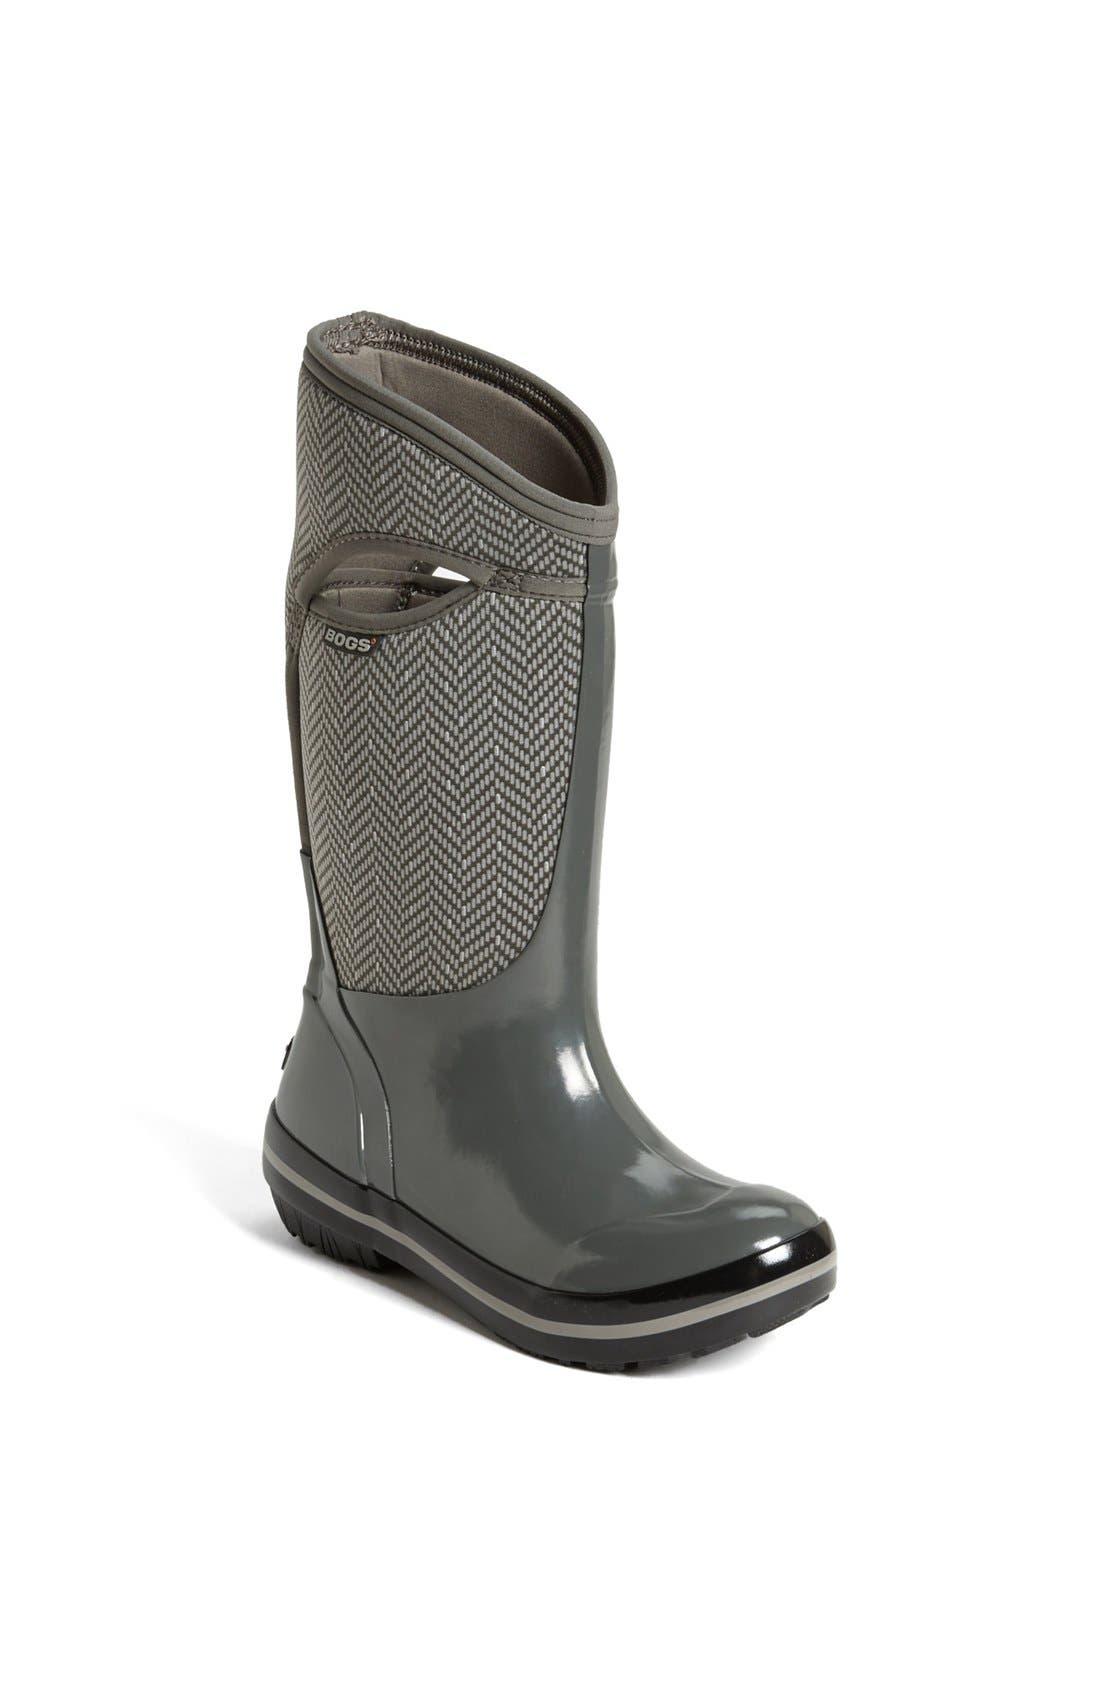 Alternate Image 1 Selected - Bogs 'Plimsoll' Tall Rain Boot (Women)